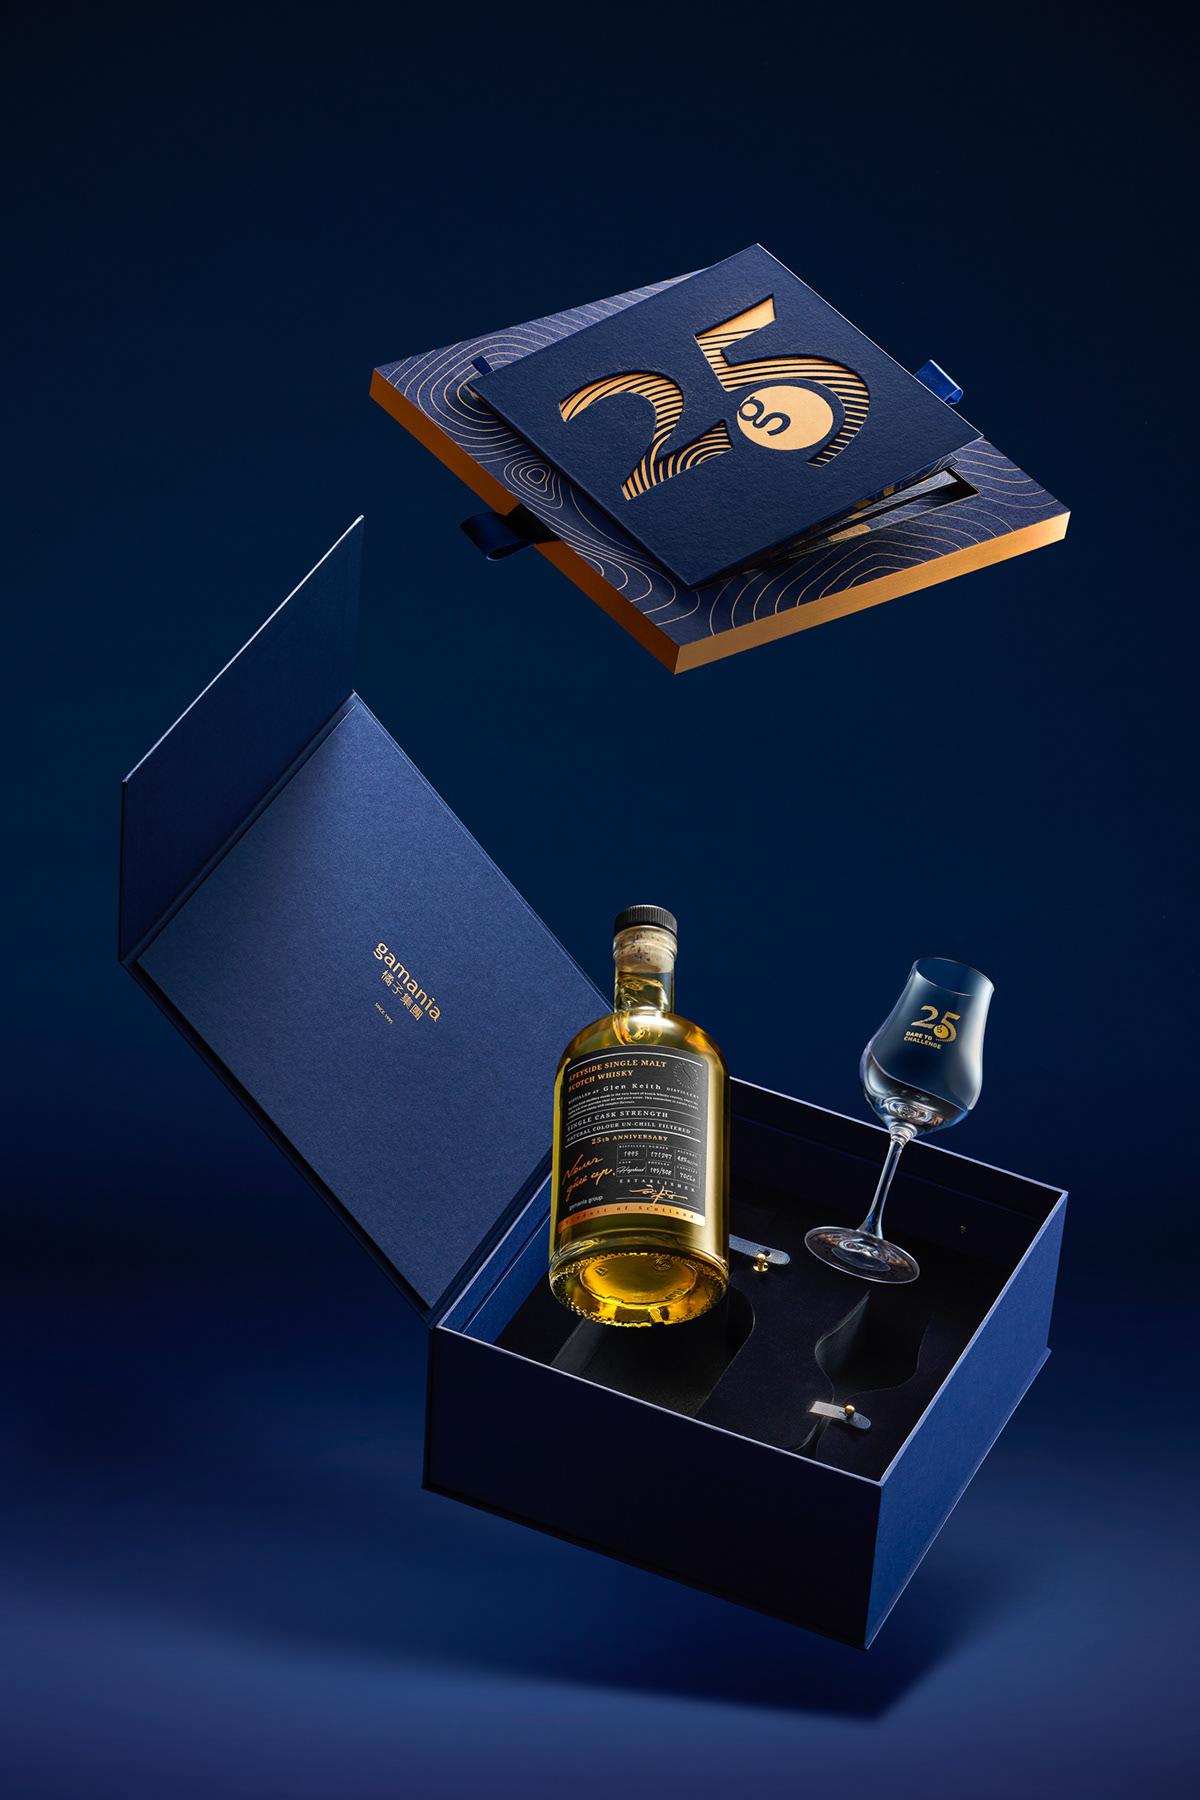 whisky box packaging design